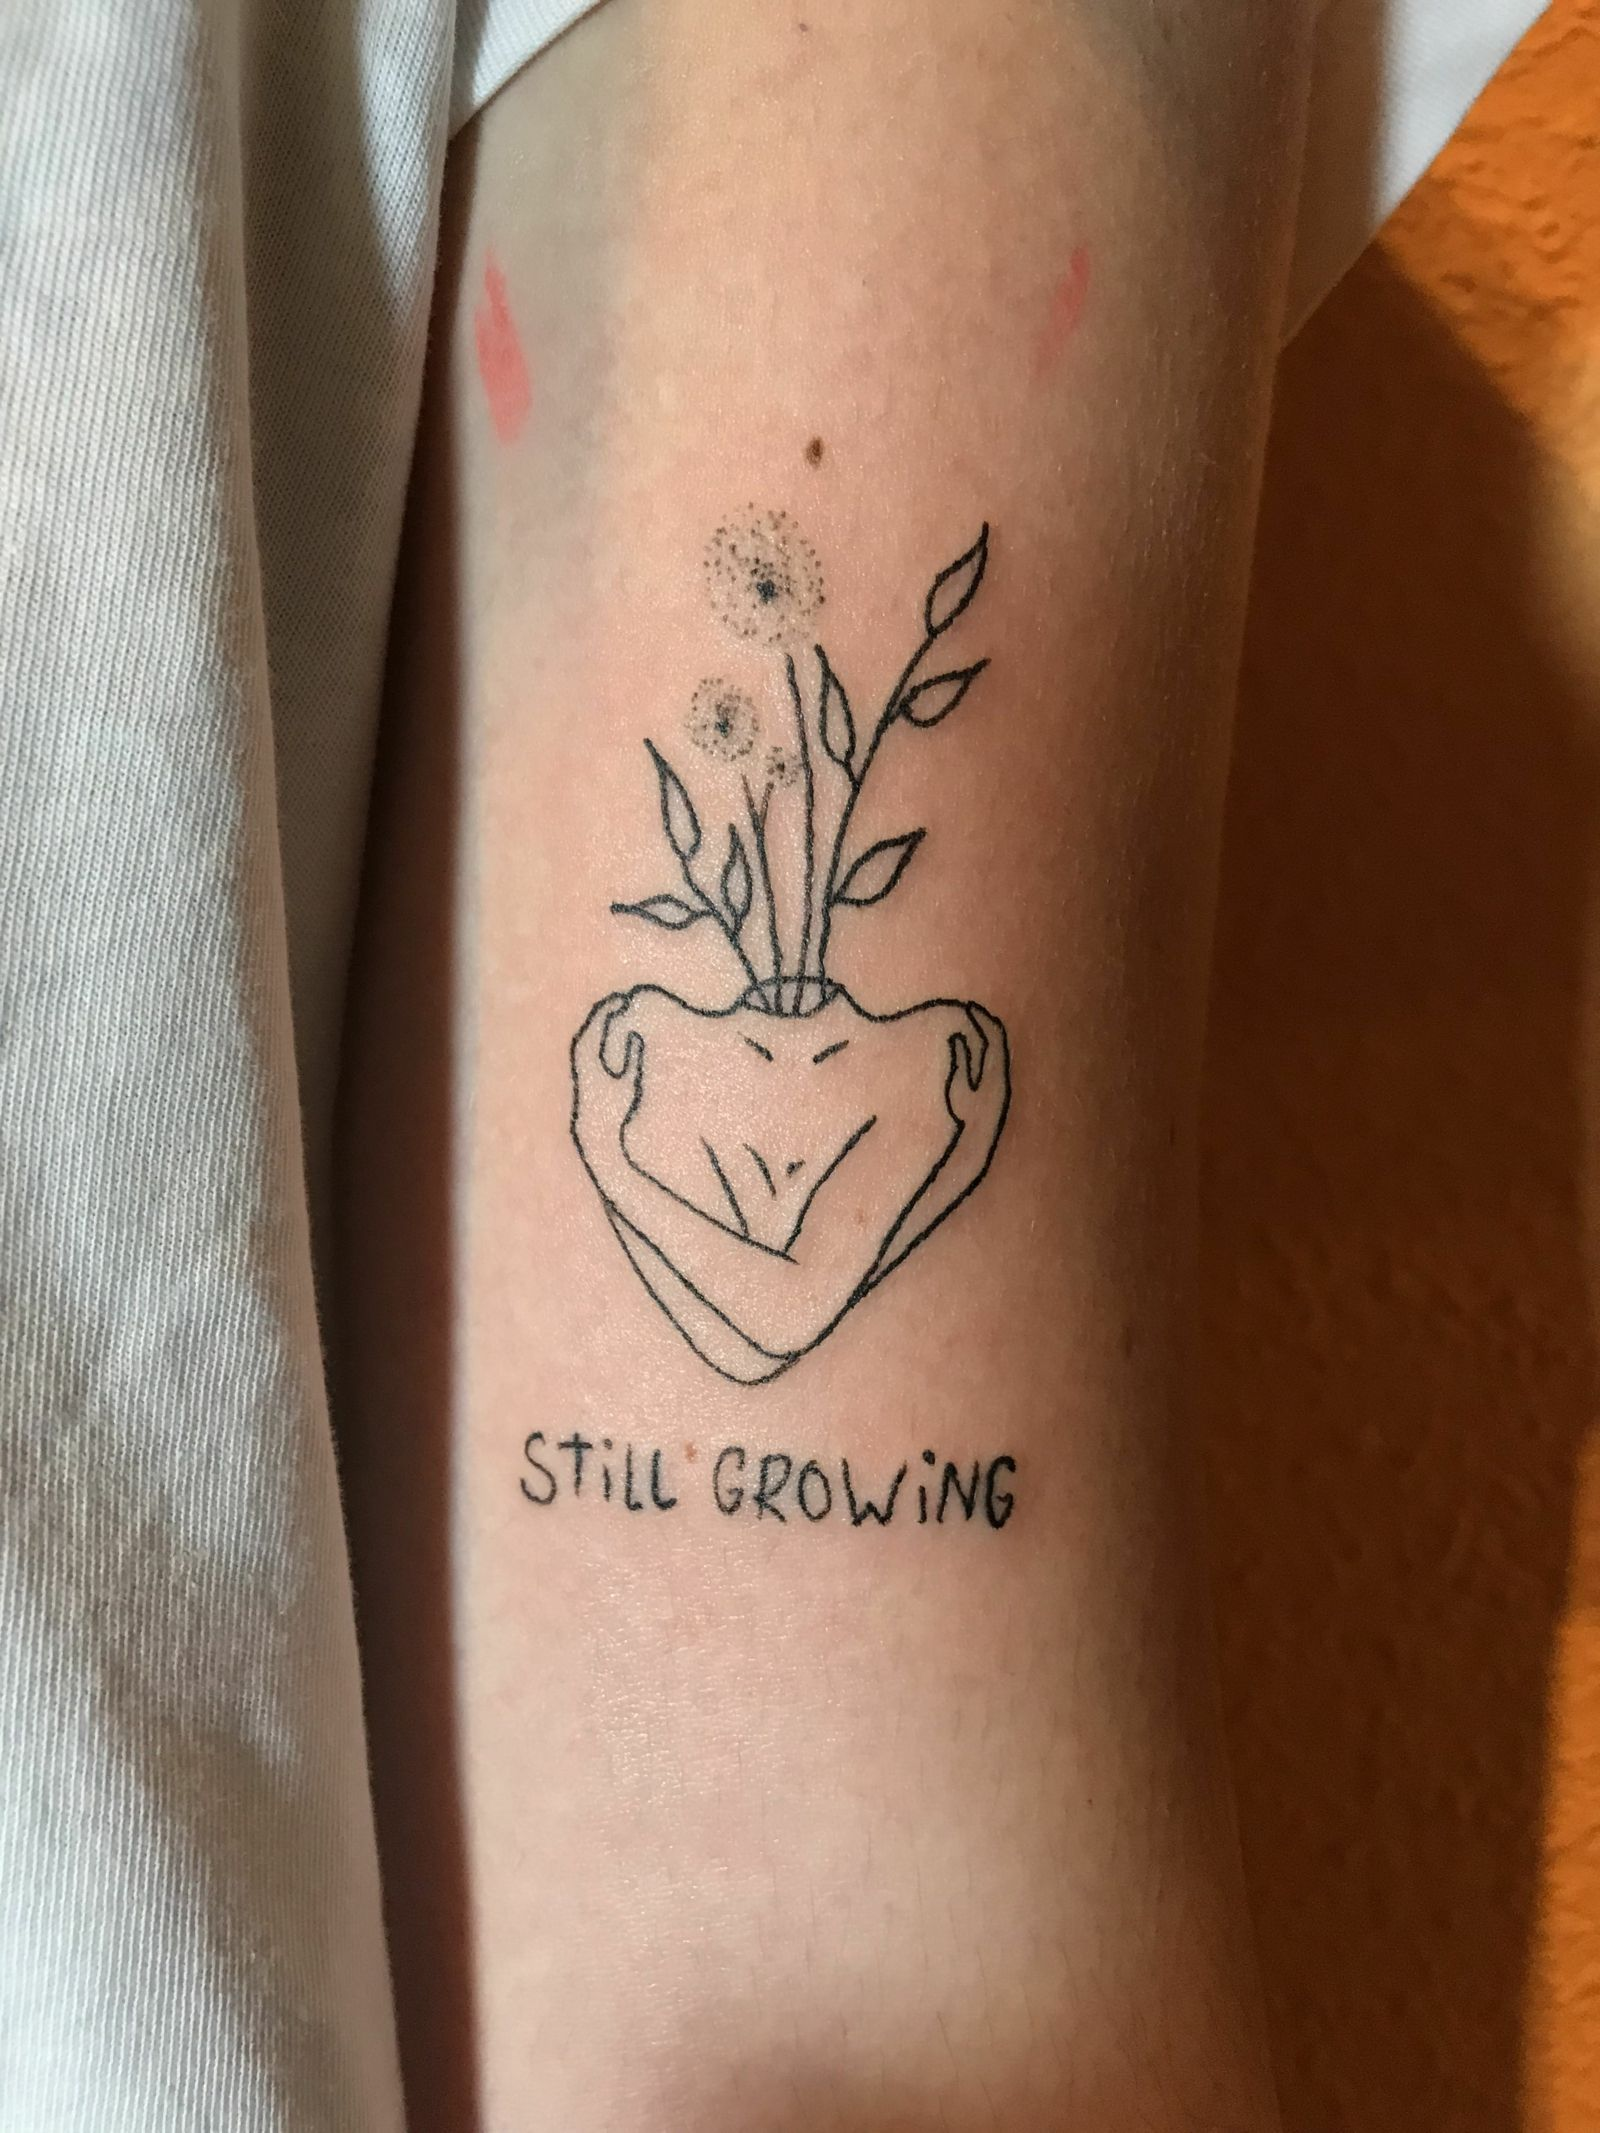 Tattoosrpüche Ideen Frauen #tattotrends #pinterest #tattoodesign #selbstpflege #sel ...